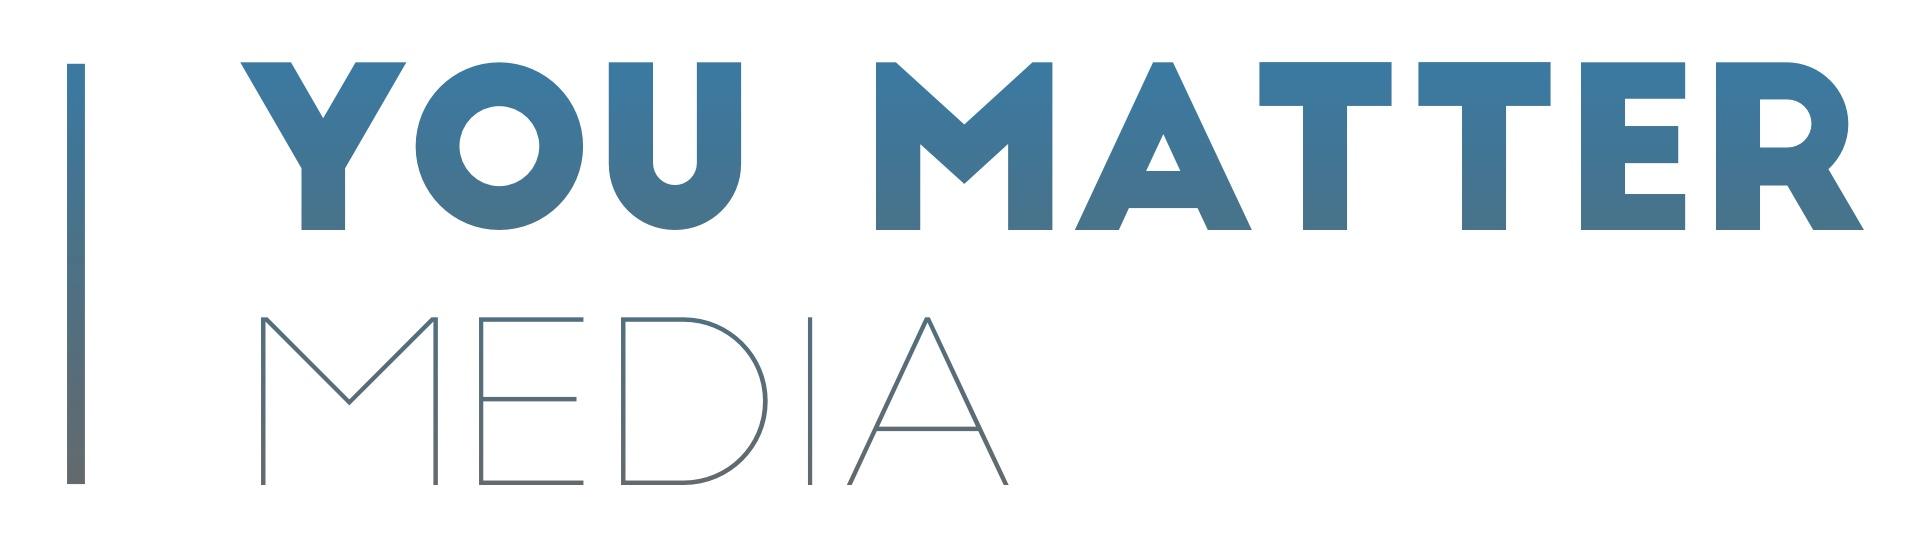 You Matter Media